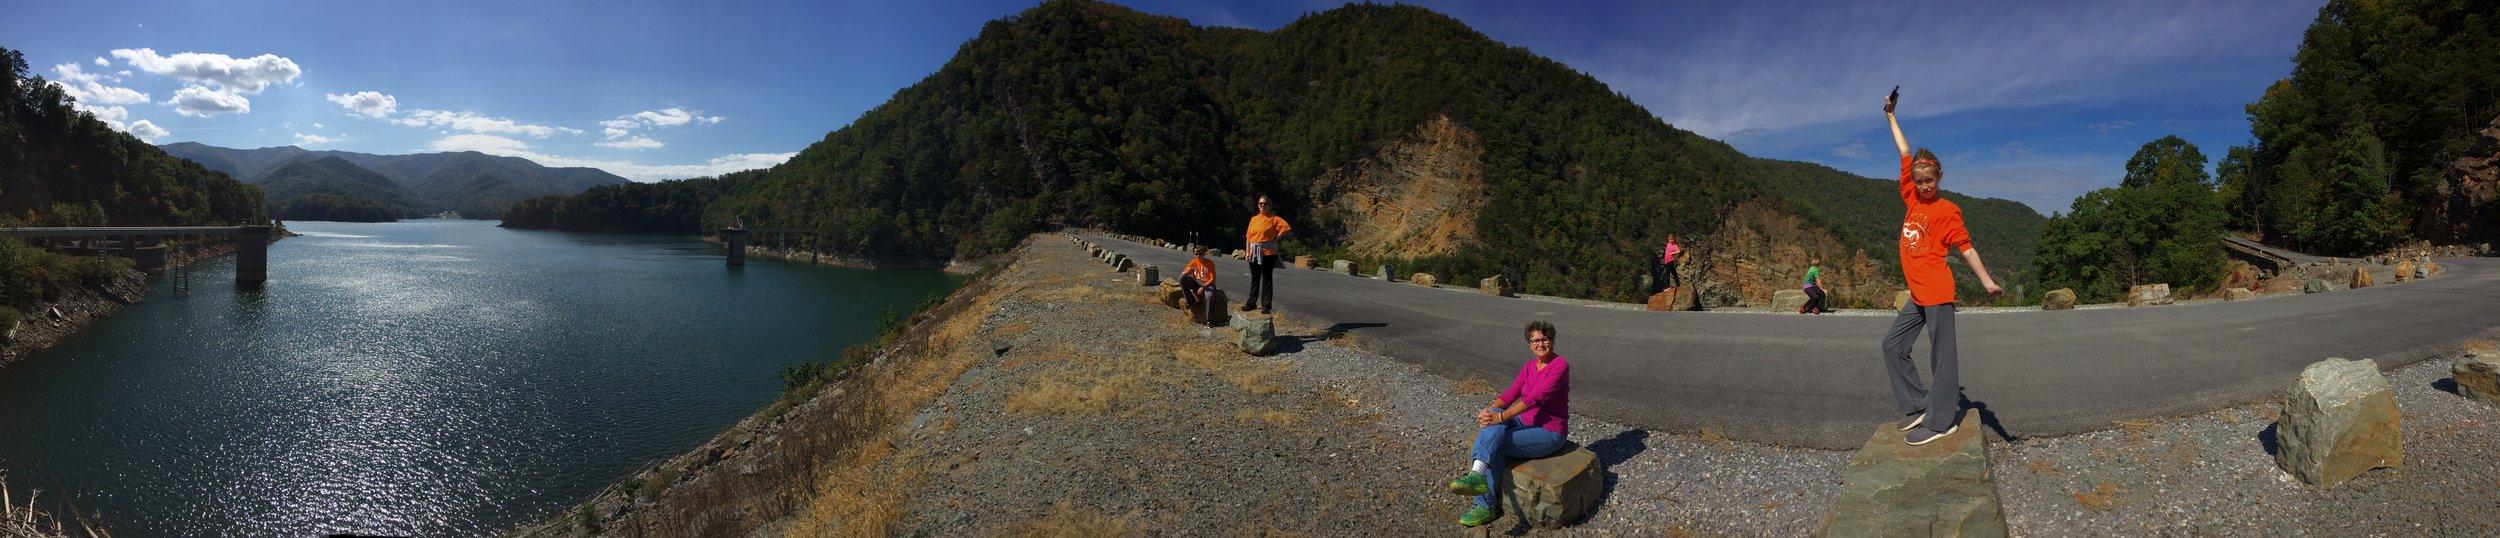 Appalachian Trail on top of the Watauga Dam